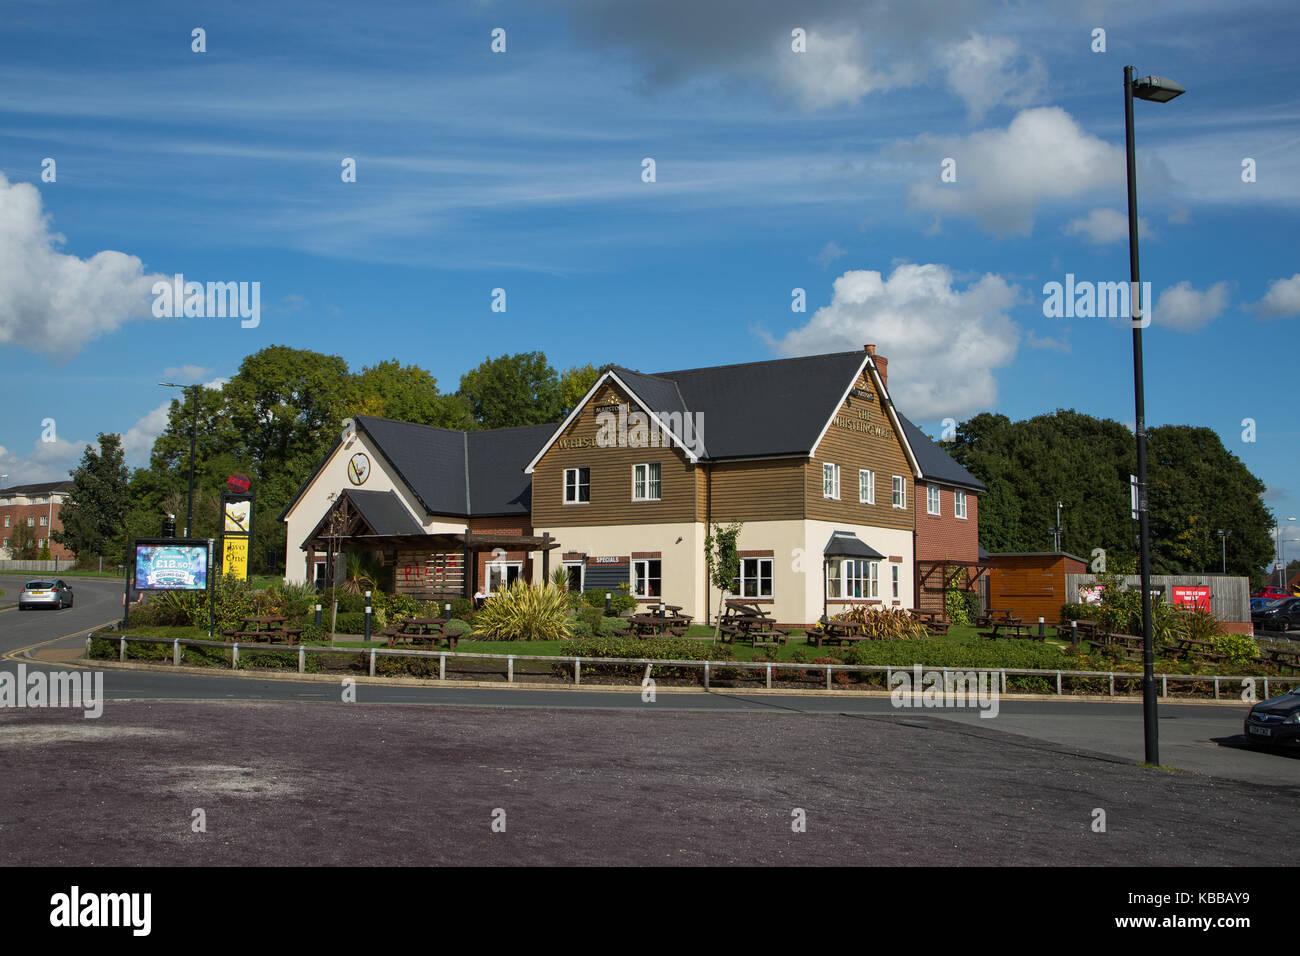 Whistling Wren Pub & Restaurant at LEigh Sports Village, Leigh, England, UK - Stock Image